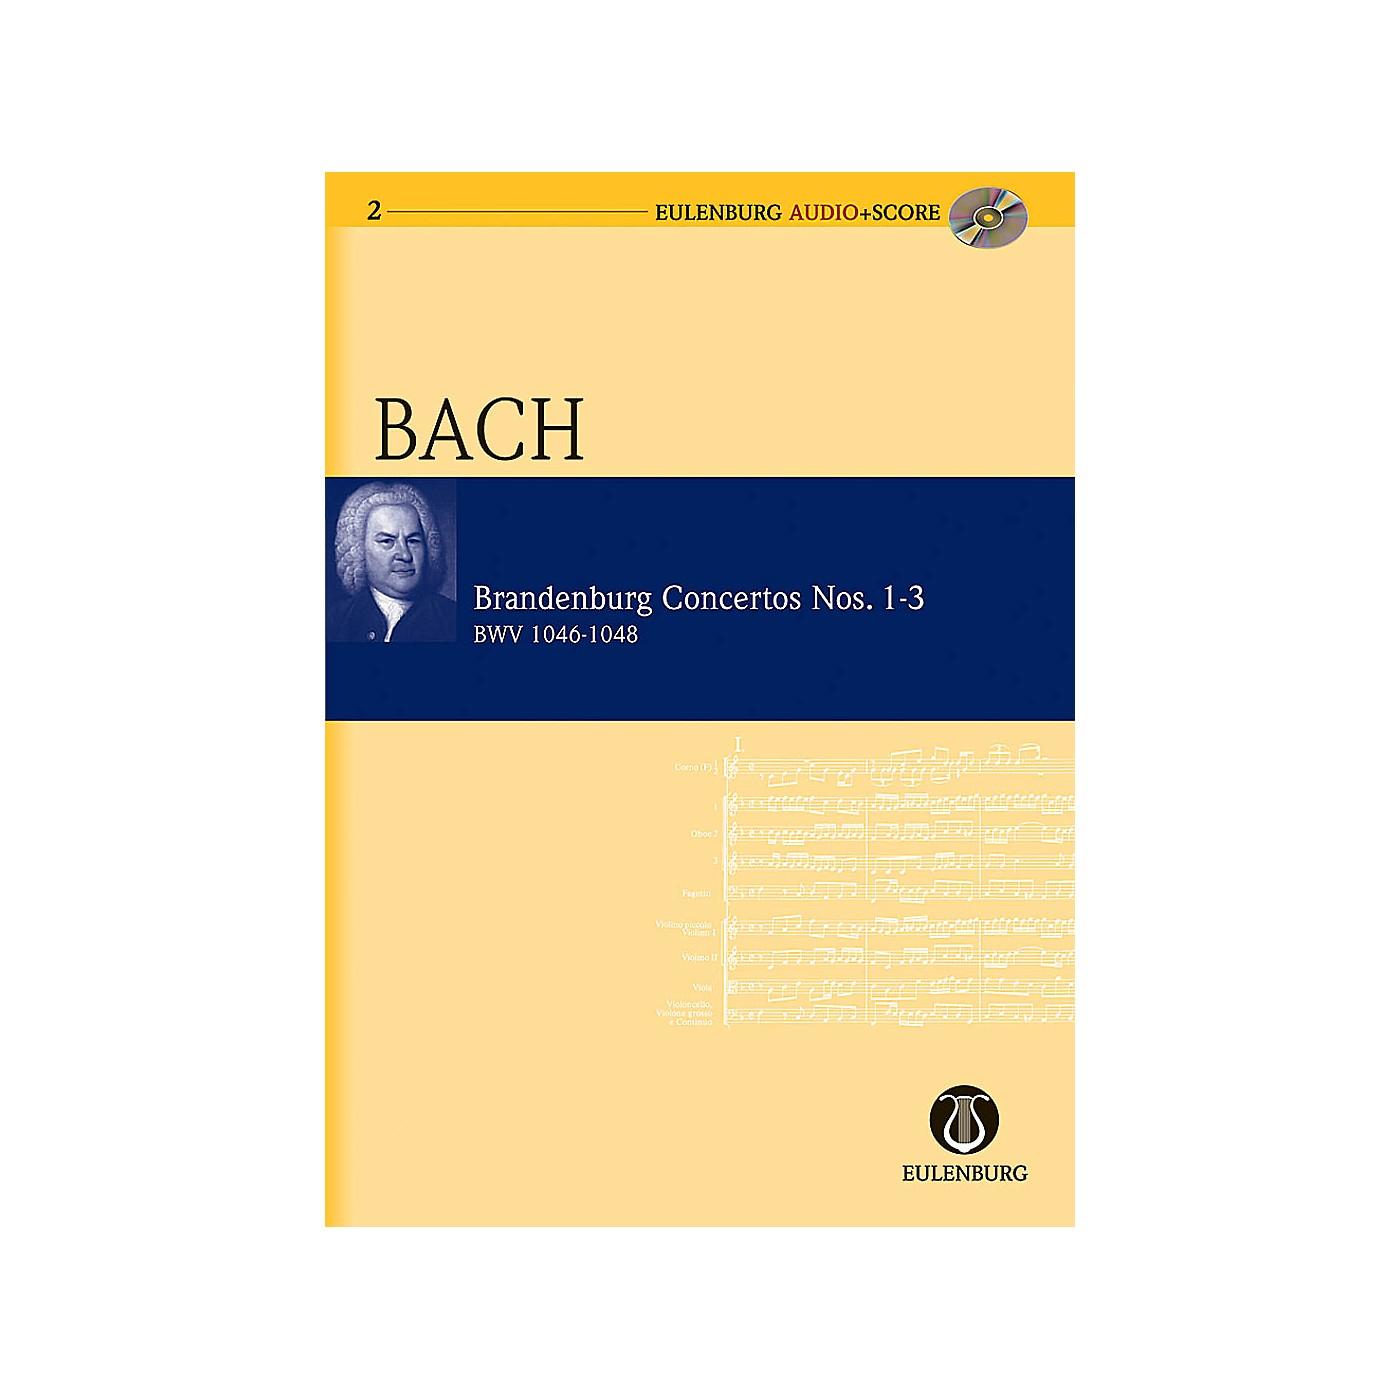 Eulenburg Brandenburg Concertos 1-3 BWV 1046/1047/1048 Eulenberg Audio plus Score with CD by Bach thumbnail